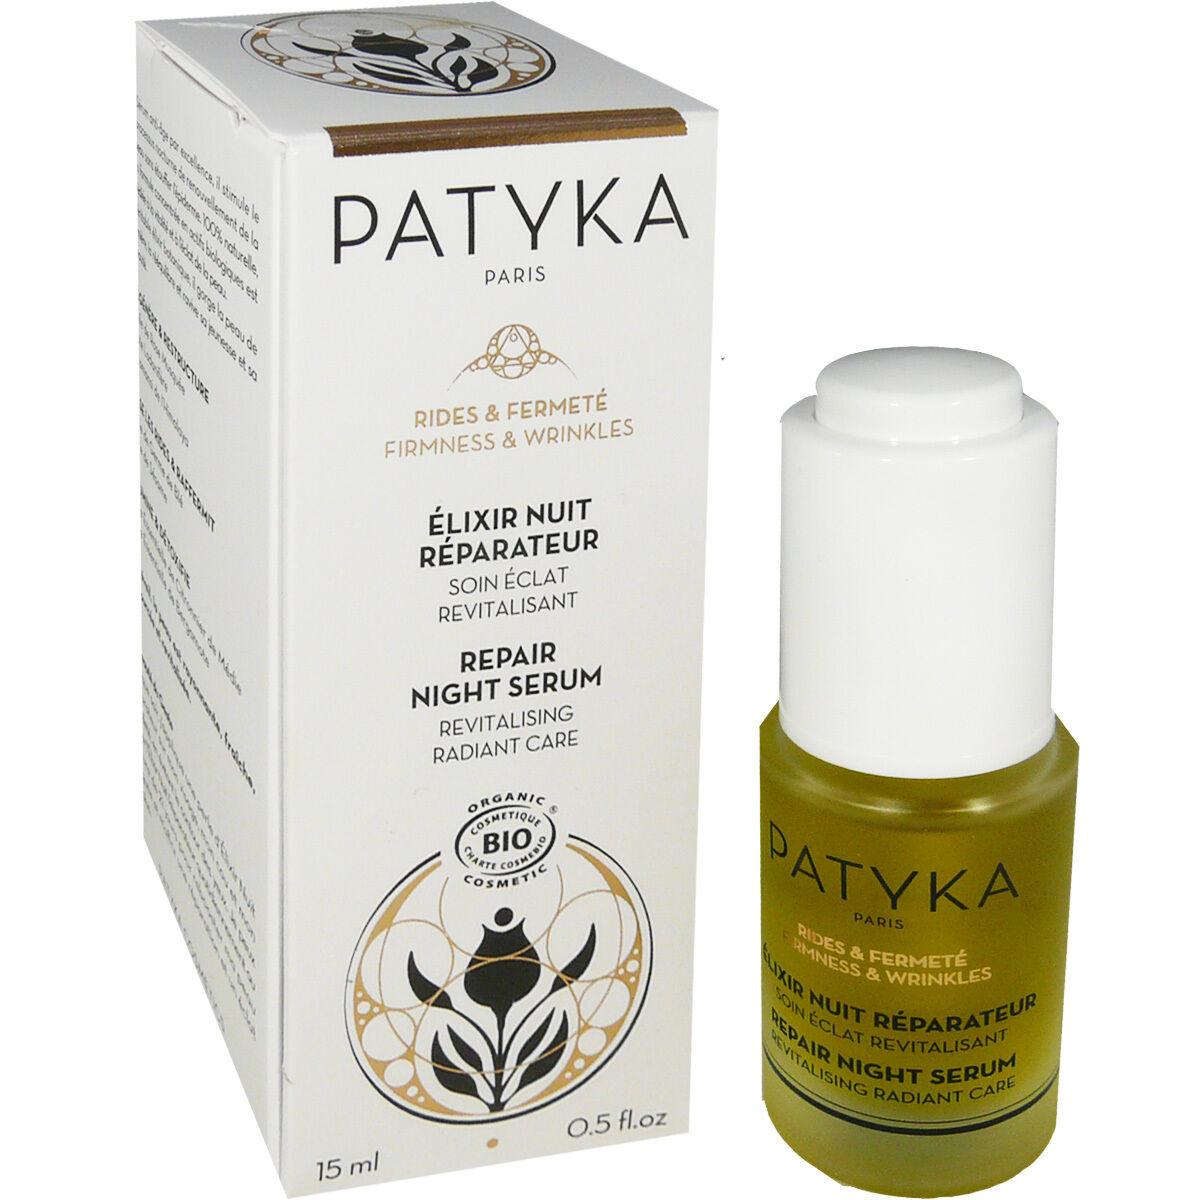 Patyka elixir nuit reparateur 15 ml bio/ vegan